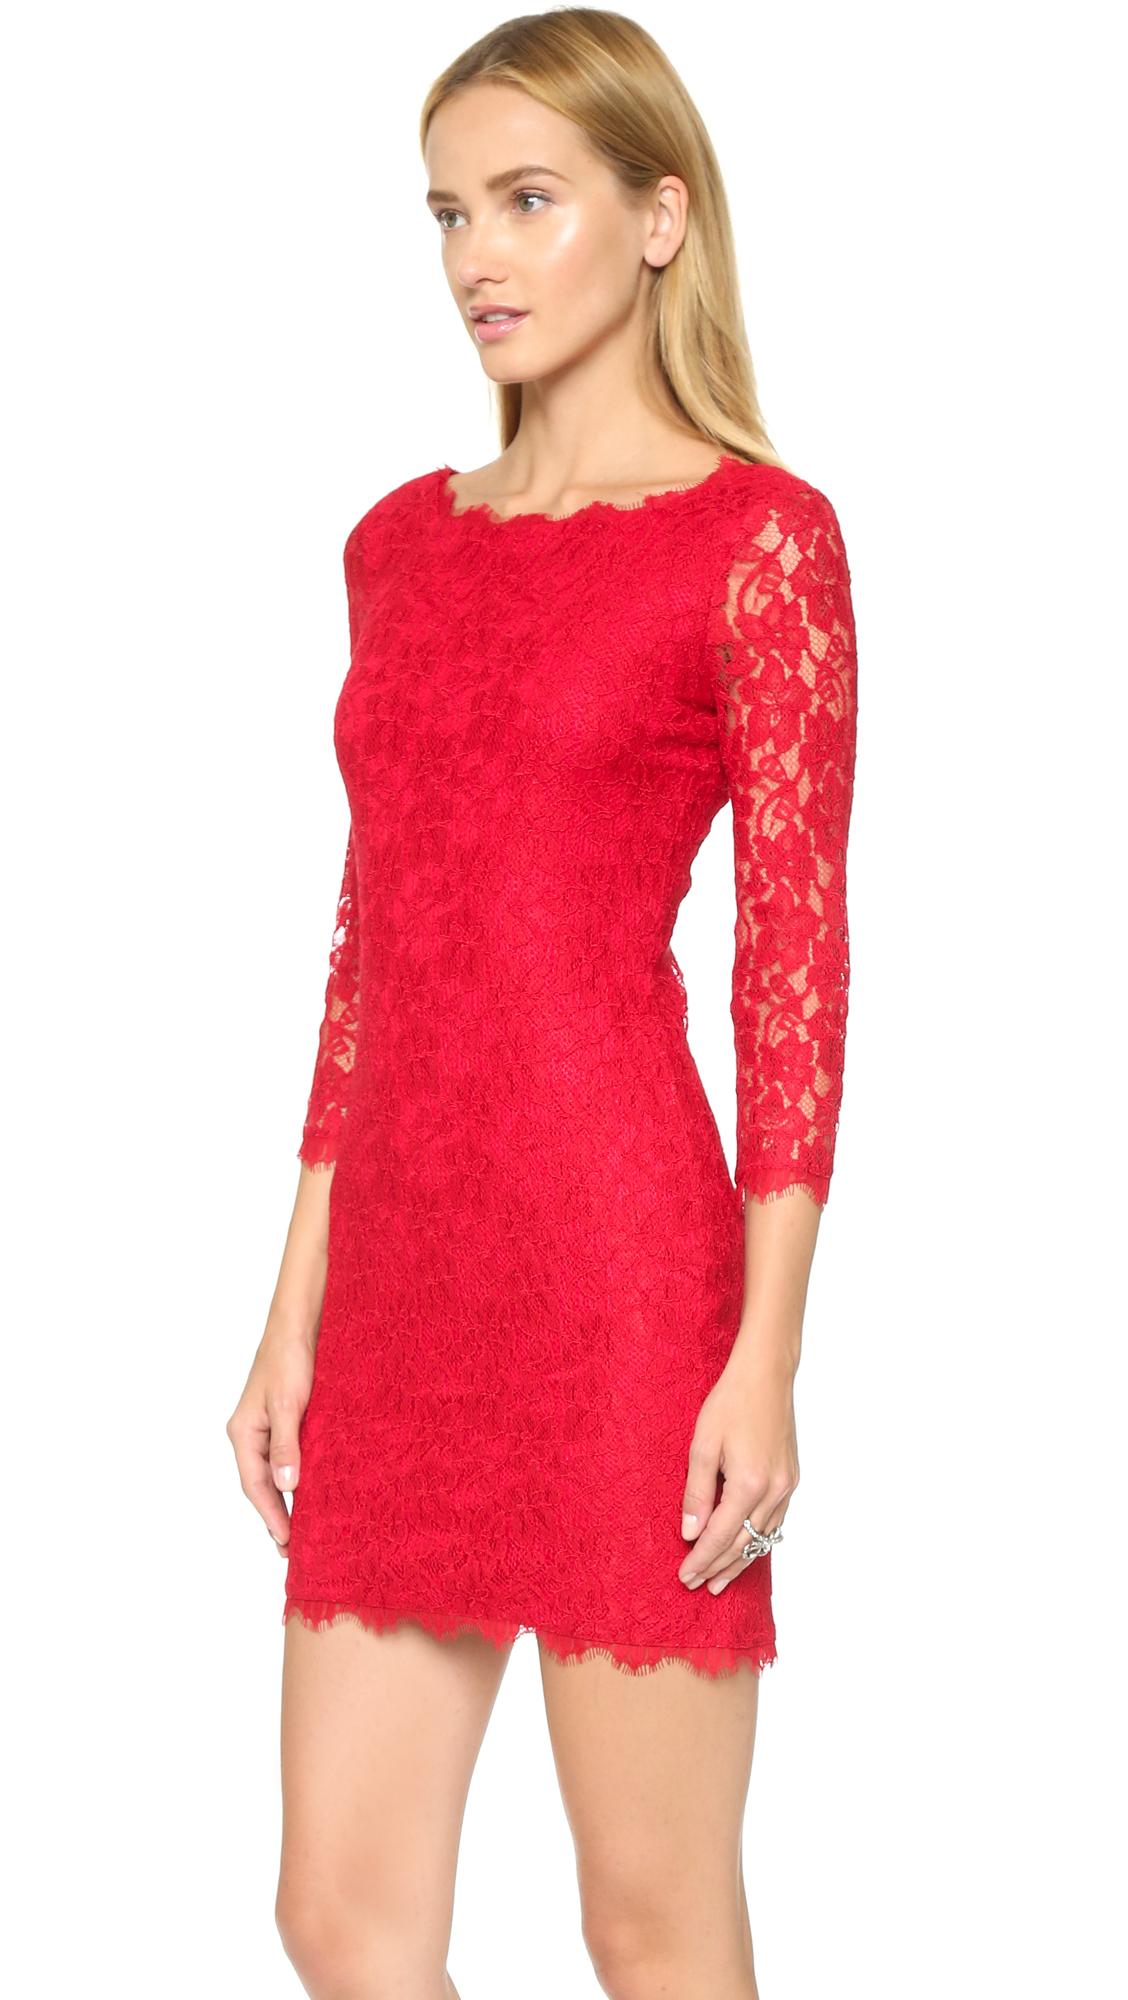 lyst diane von furstenberg zarita dress lacquer red in red. Black Bedroom Furniture Sets. Home Design Ideas